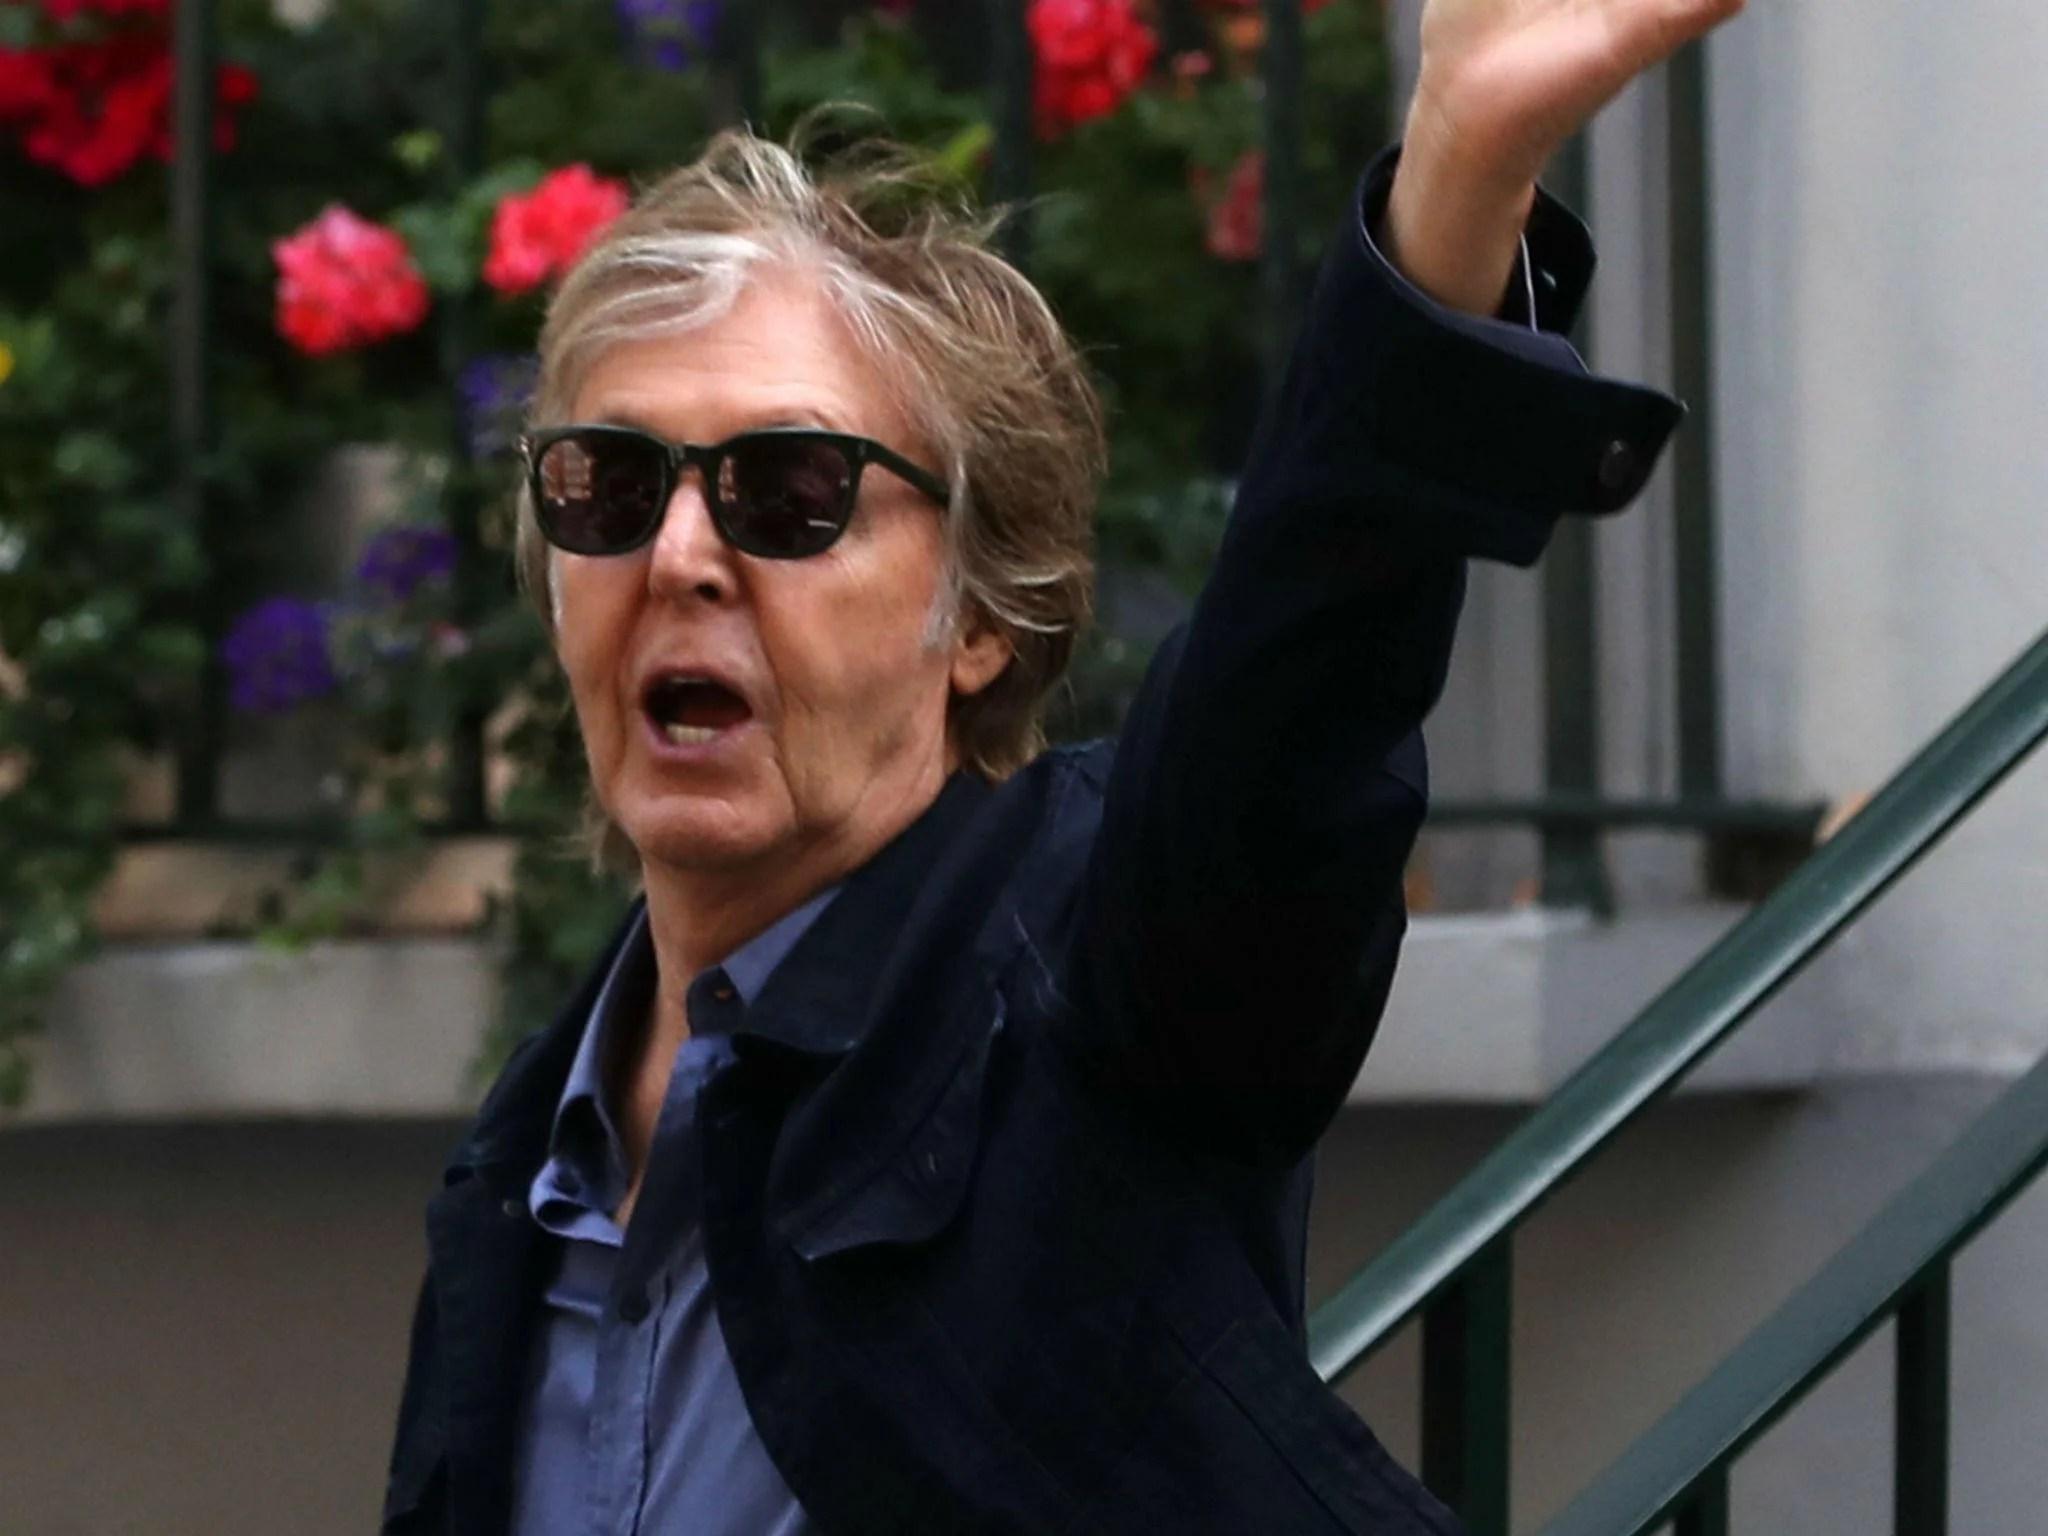 Paul McCartney recreates legendary Beatles Abbey Road